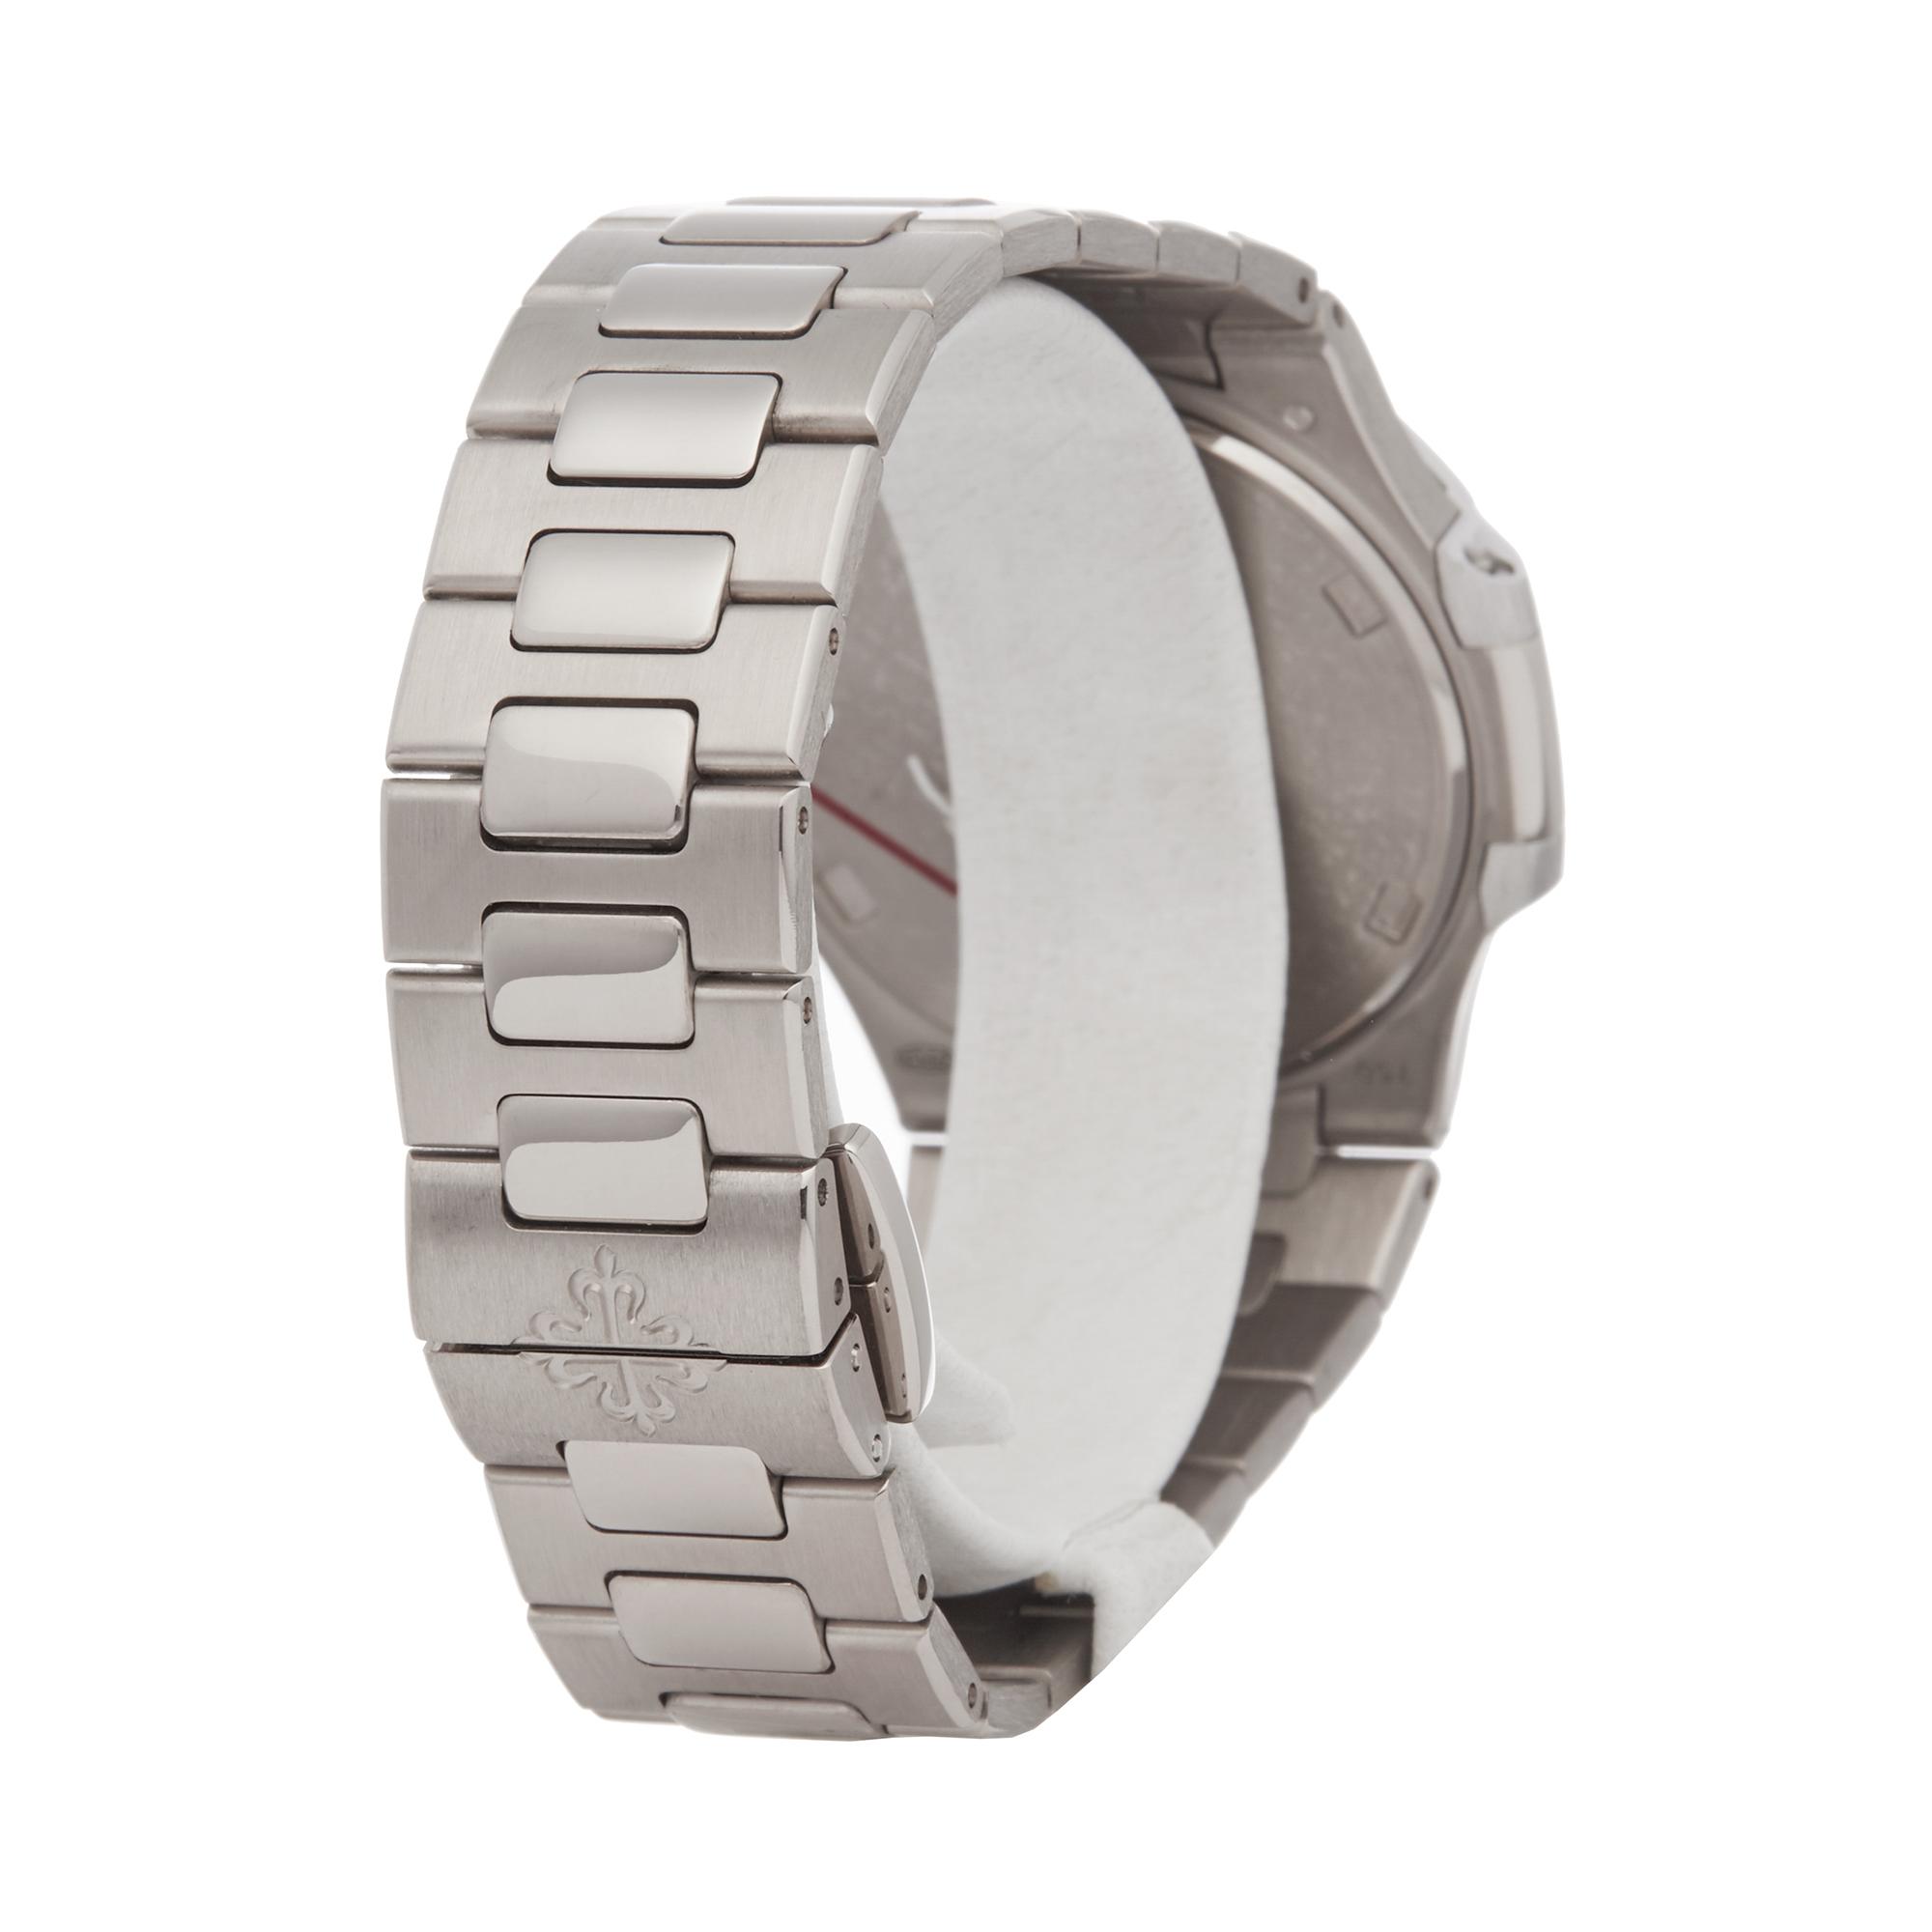 Patek Philippe Nautilus 7010G Ladies White Gold Diamond Watch - Image 5 of 8